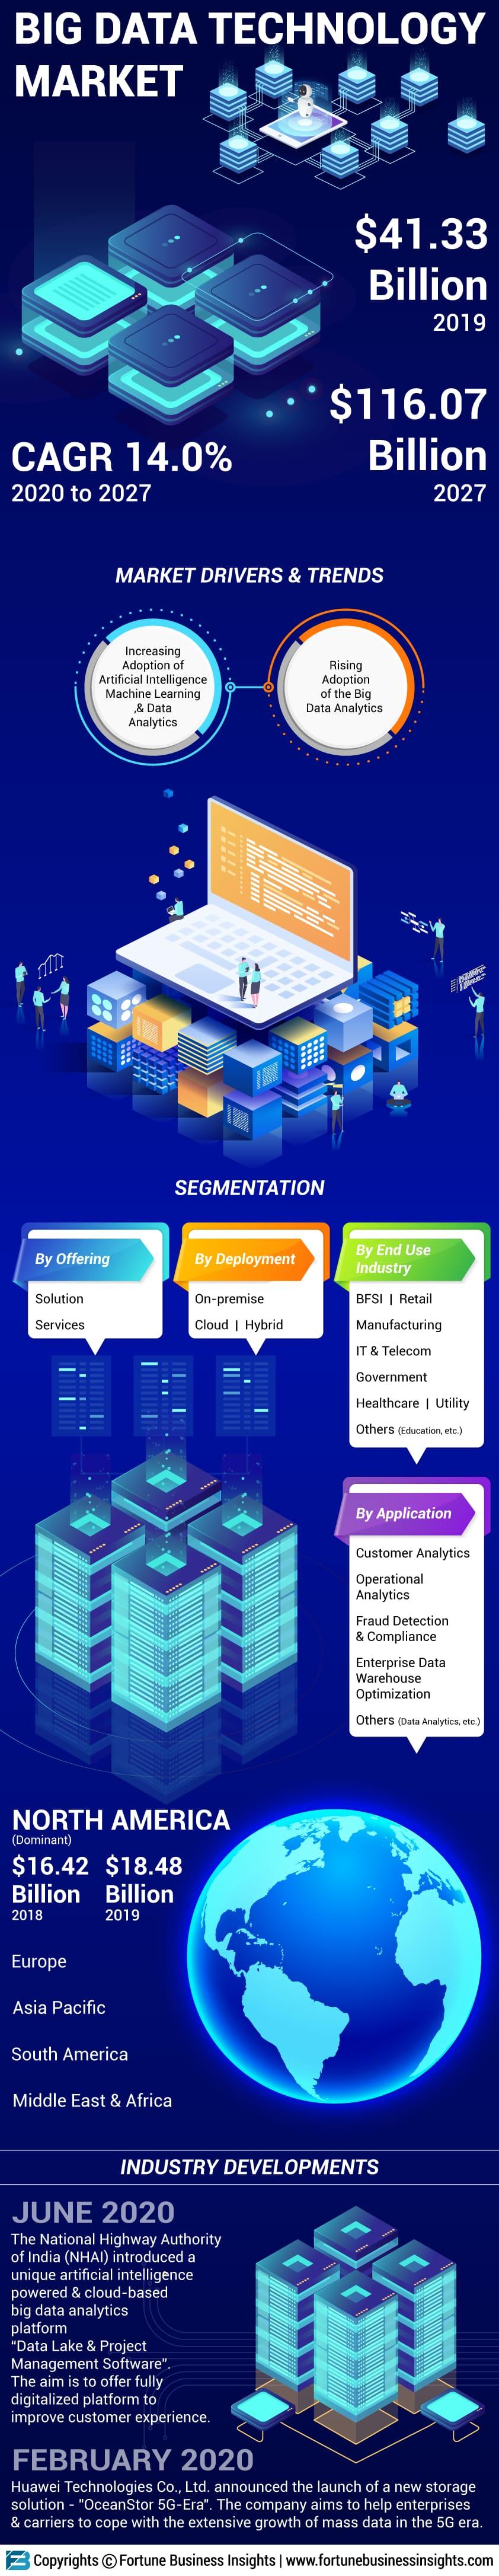 Big Data Technology Market